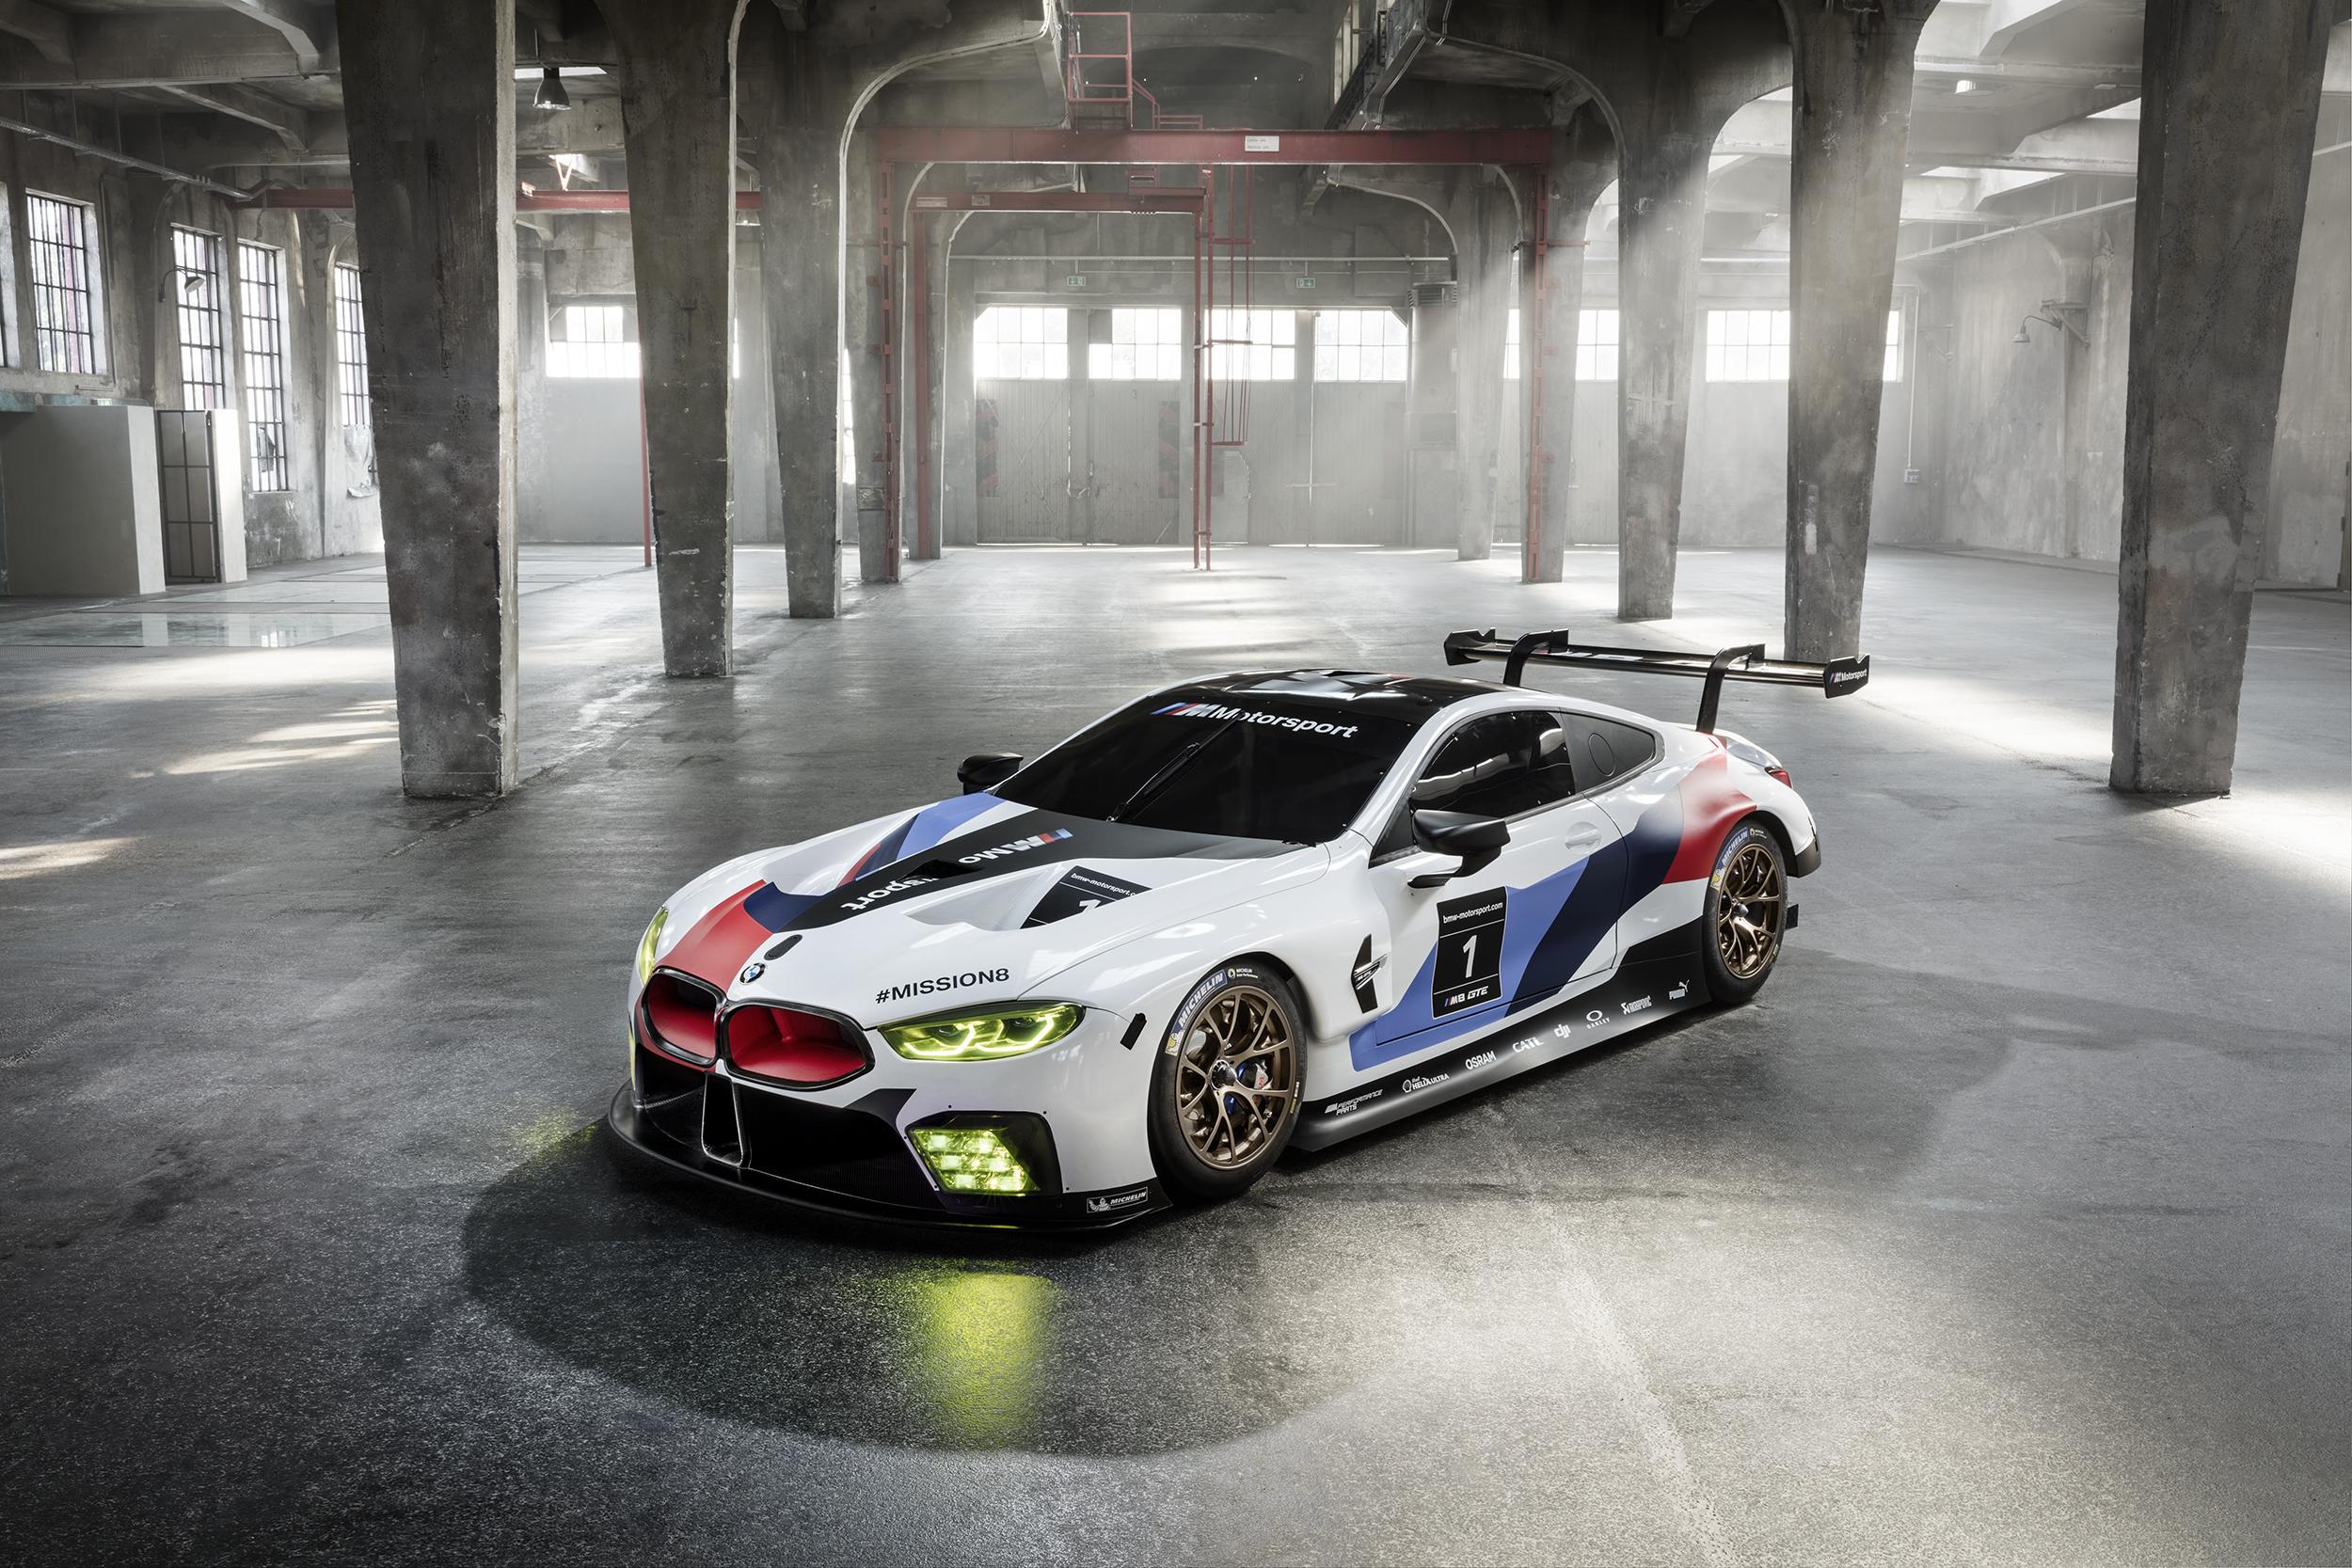 World Premier: The BMW M8 GTE Race Car - BimmerFile